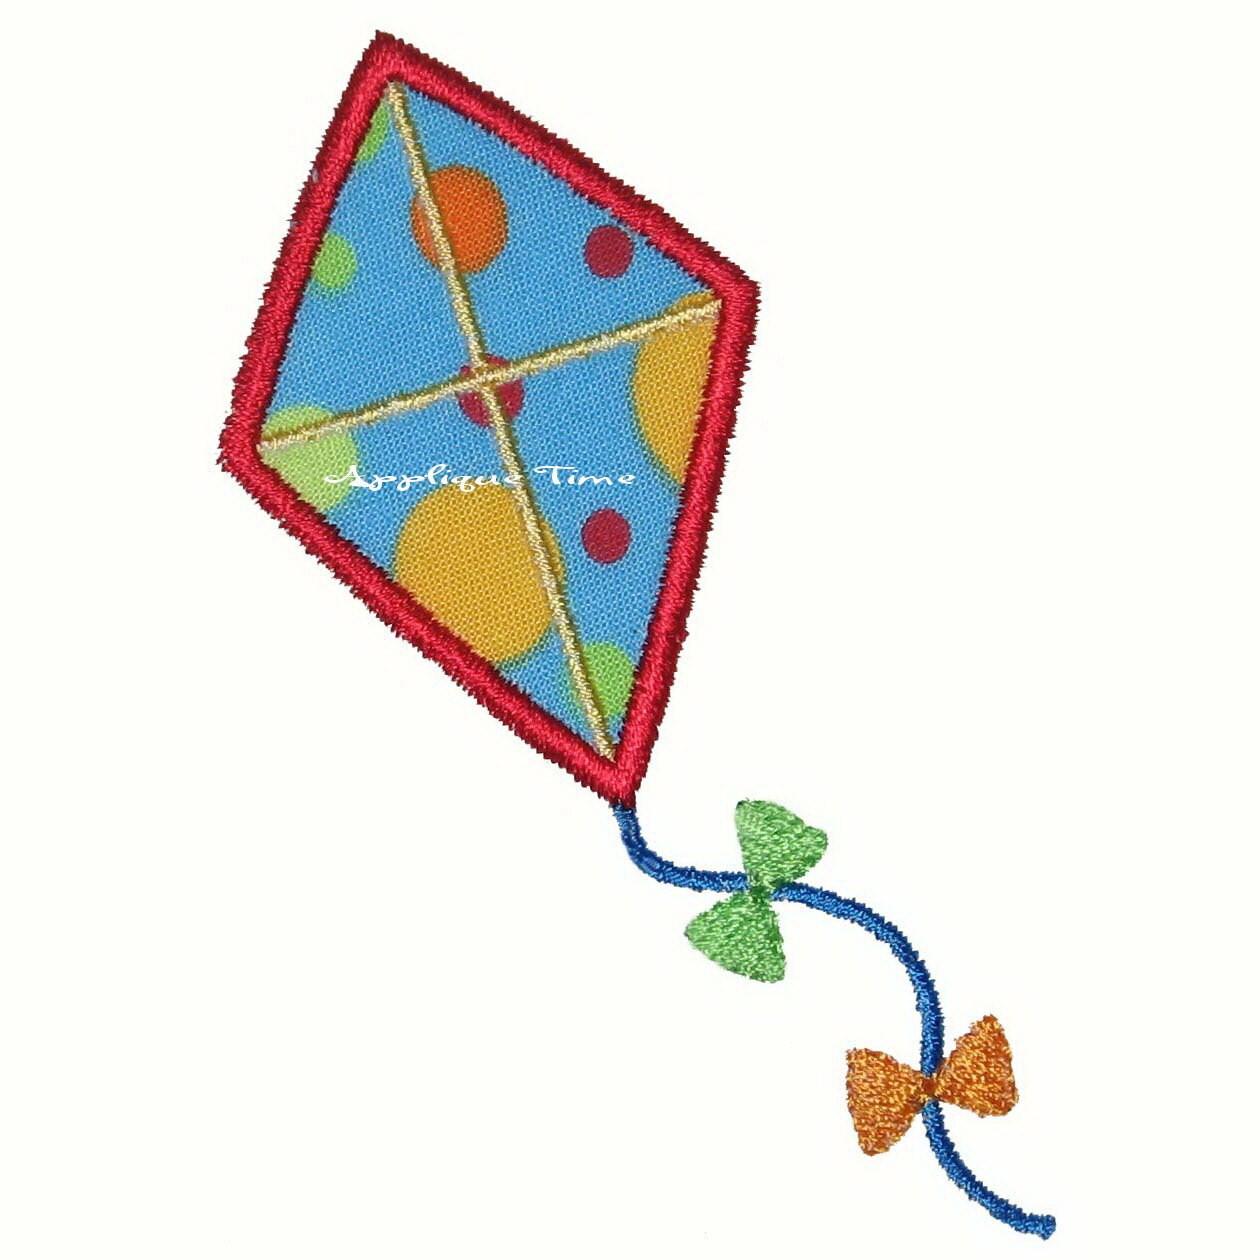 instant download kite machine embroidery applique design 4x4. Black Bedroom Furniture Sets. Home Design Ideas